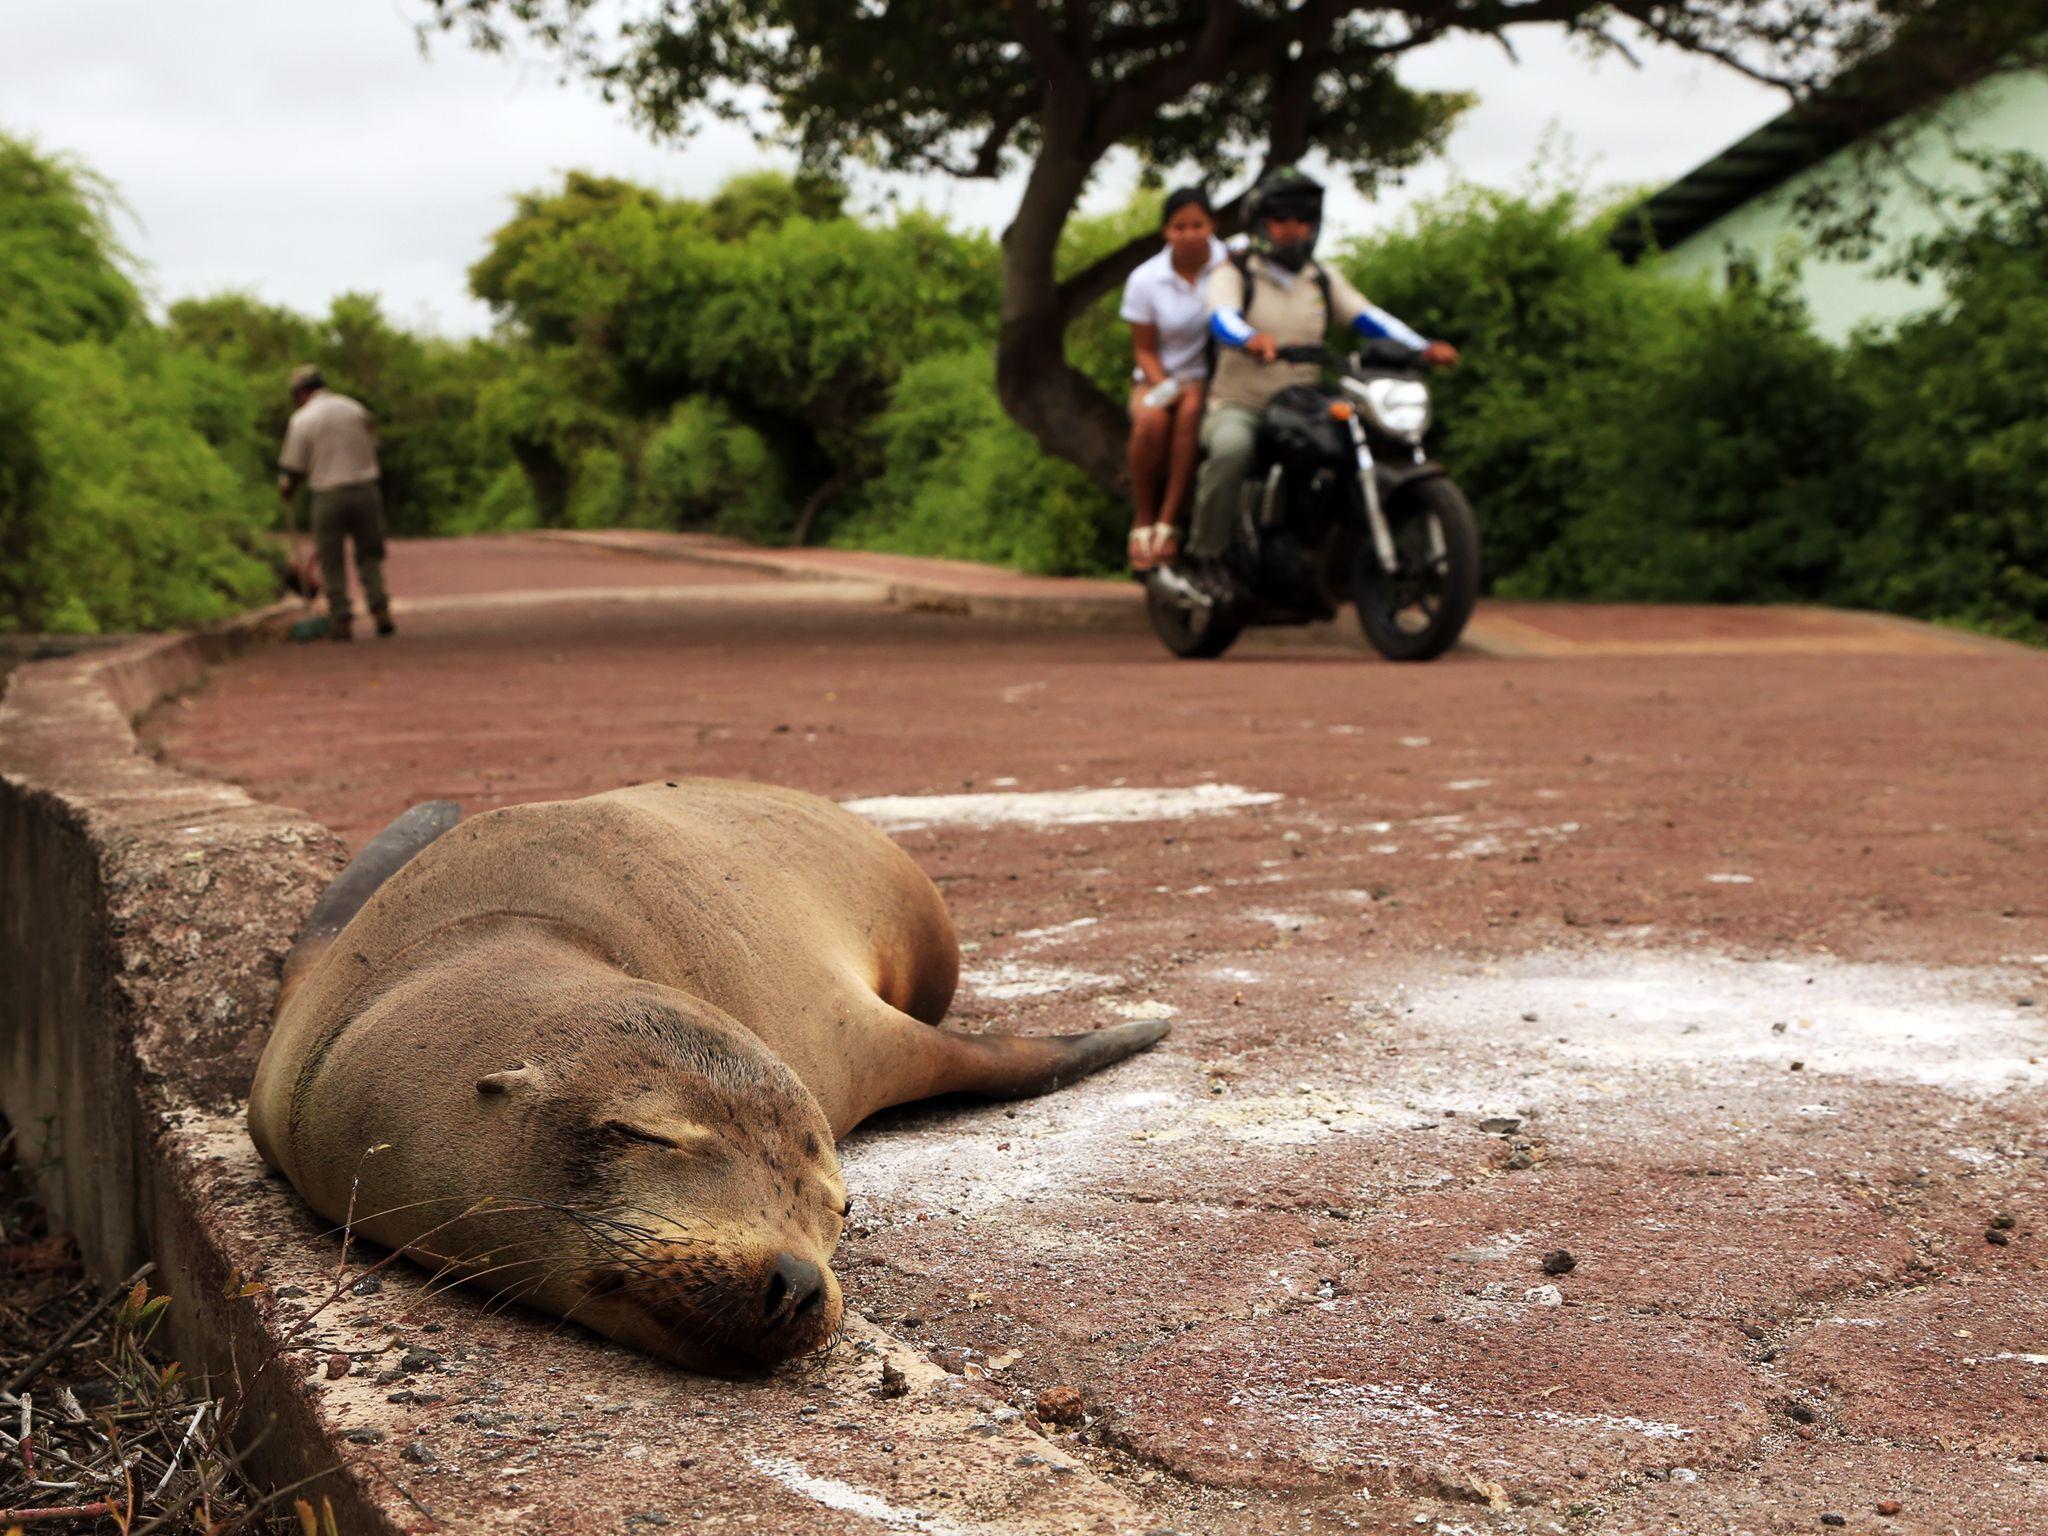 Puerto Ayora, Santa Cruz Island, Galapagos, Ecuador: A sea lion sleeps on the road at Galapagos... [Photo of the day - December 2014]